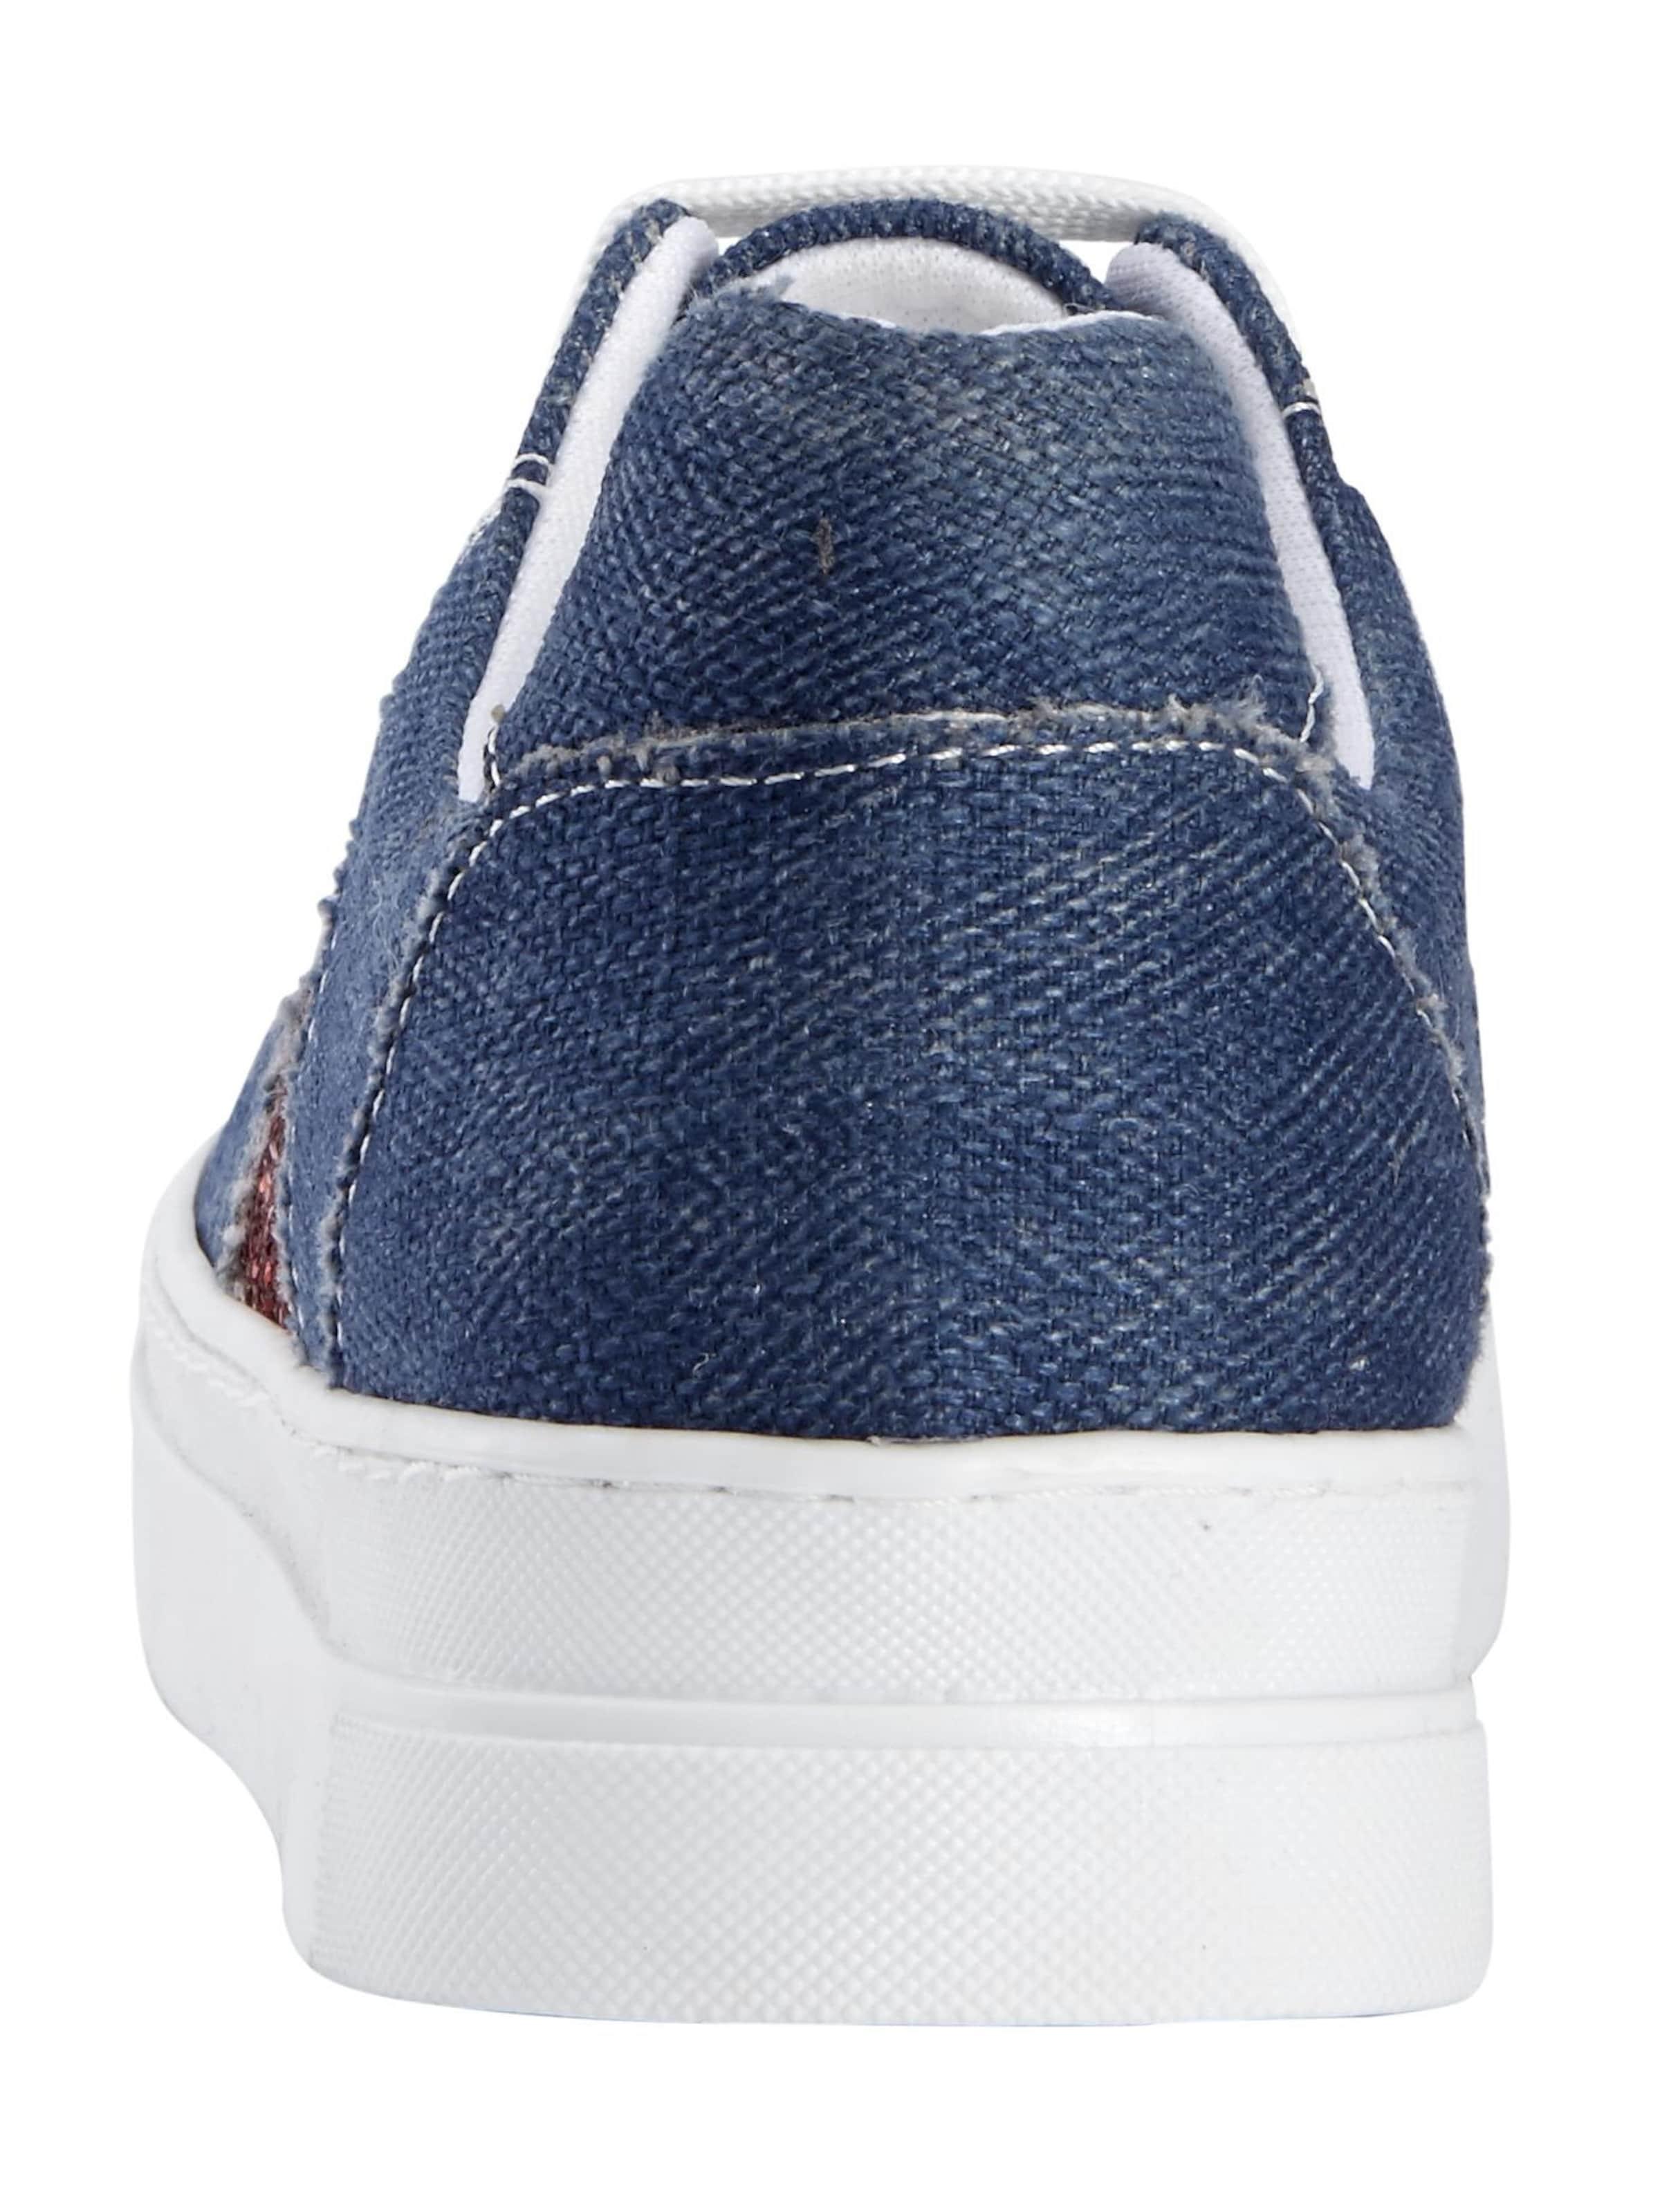 Sneaker Weiß In Andrea Conti Blue DenimRotmeliert QrCodBeWx